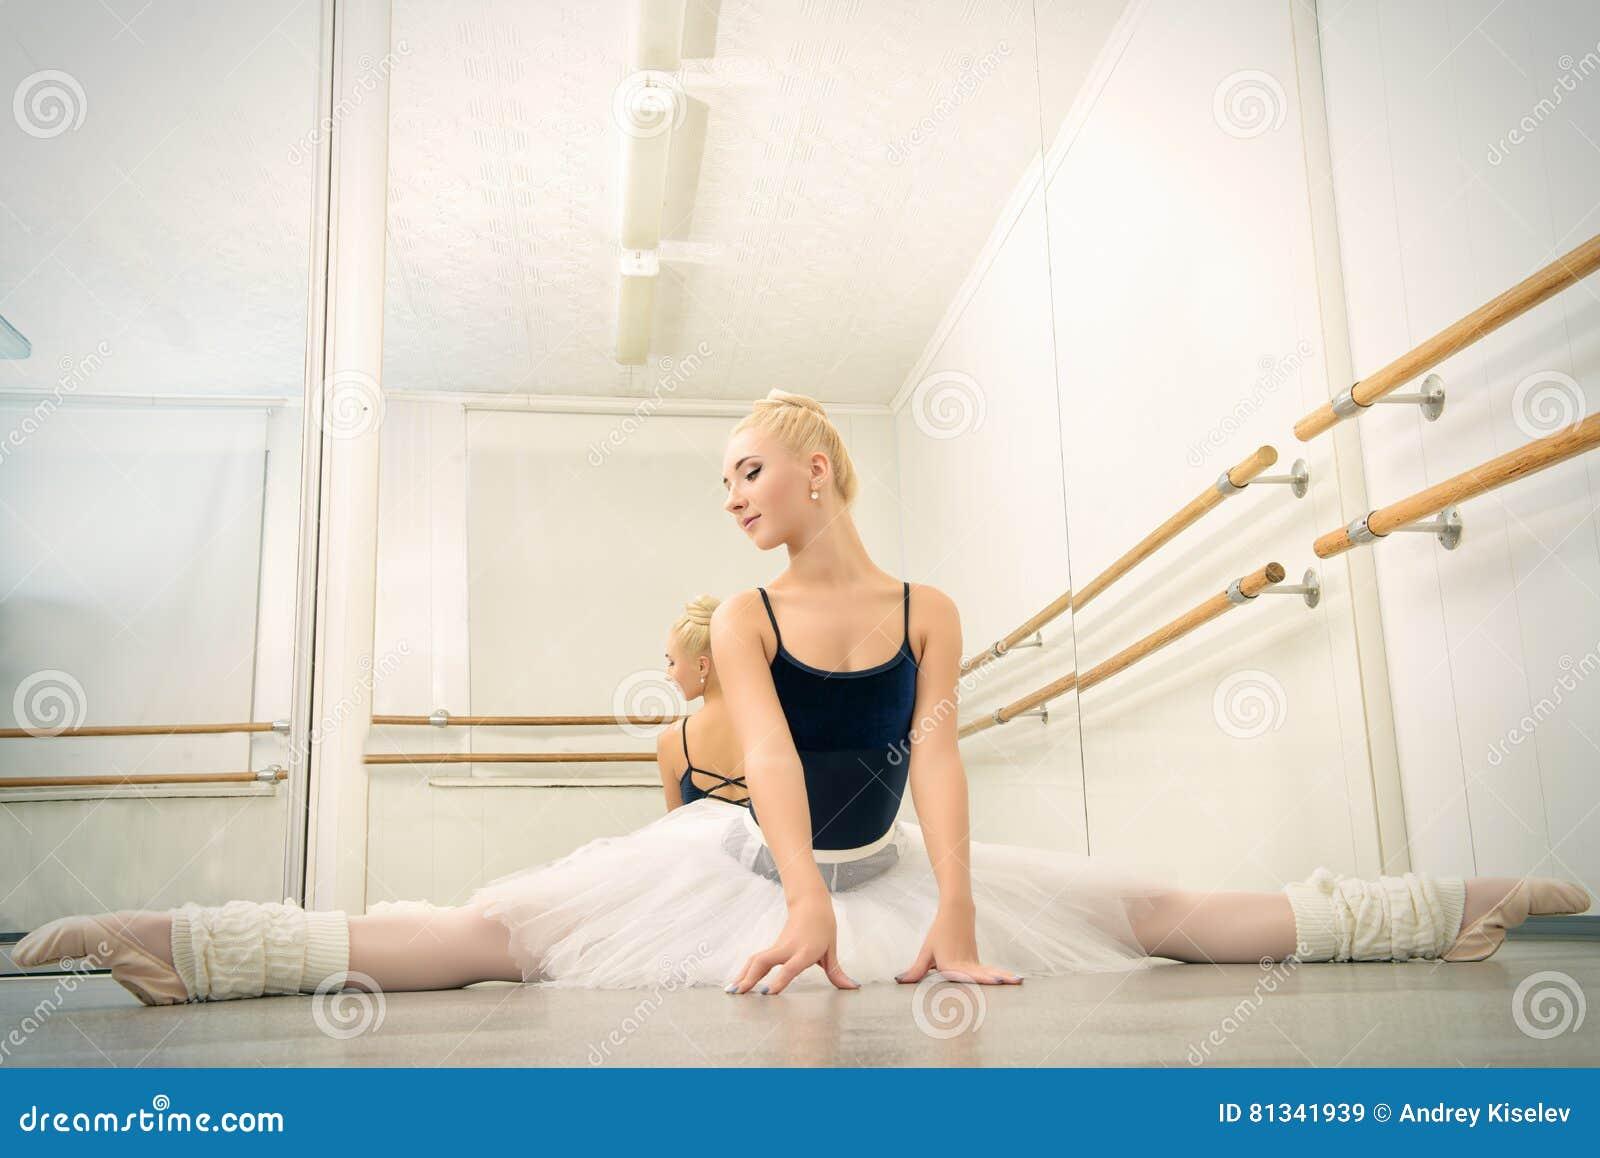 Training in ballet class